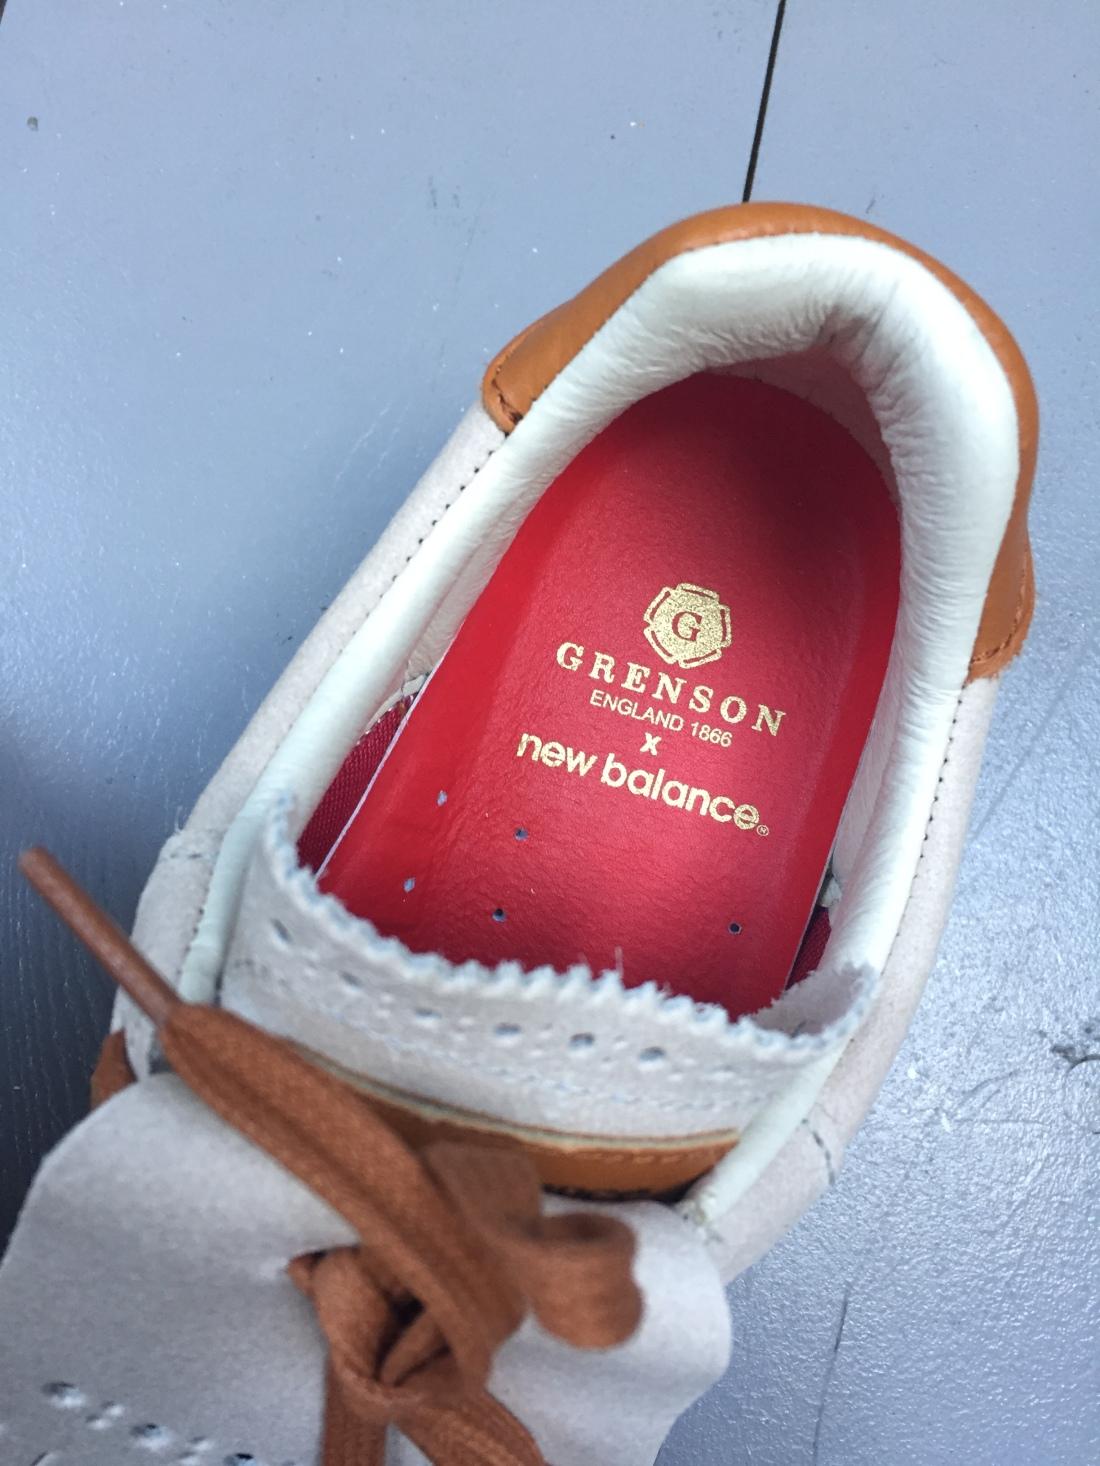 Grenson New Balance sneakers